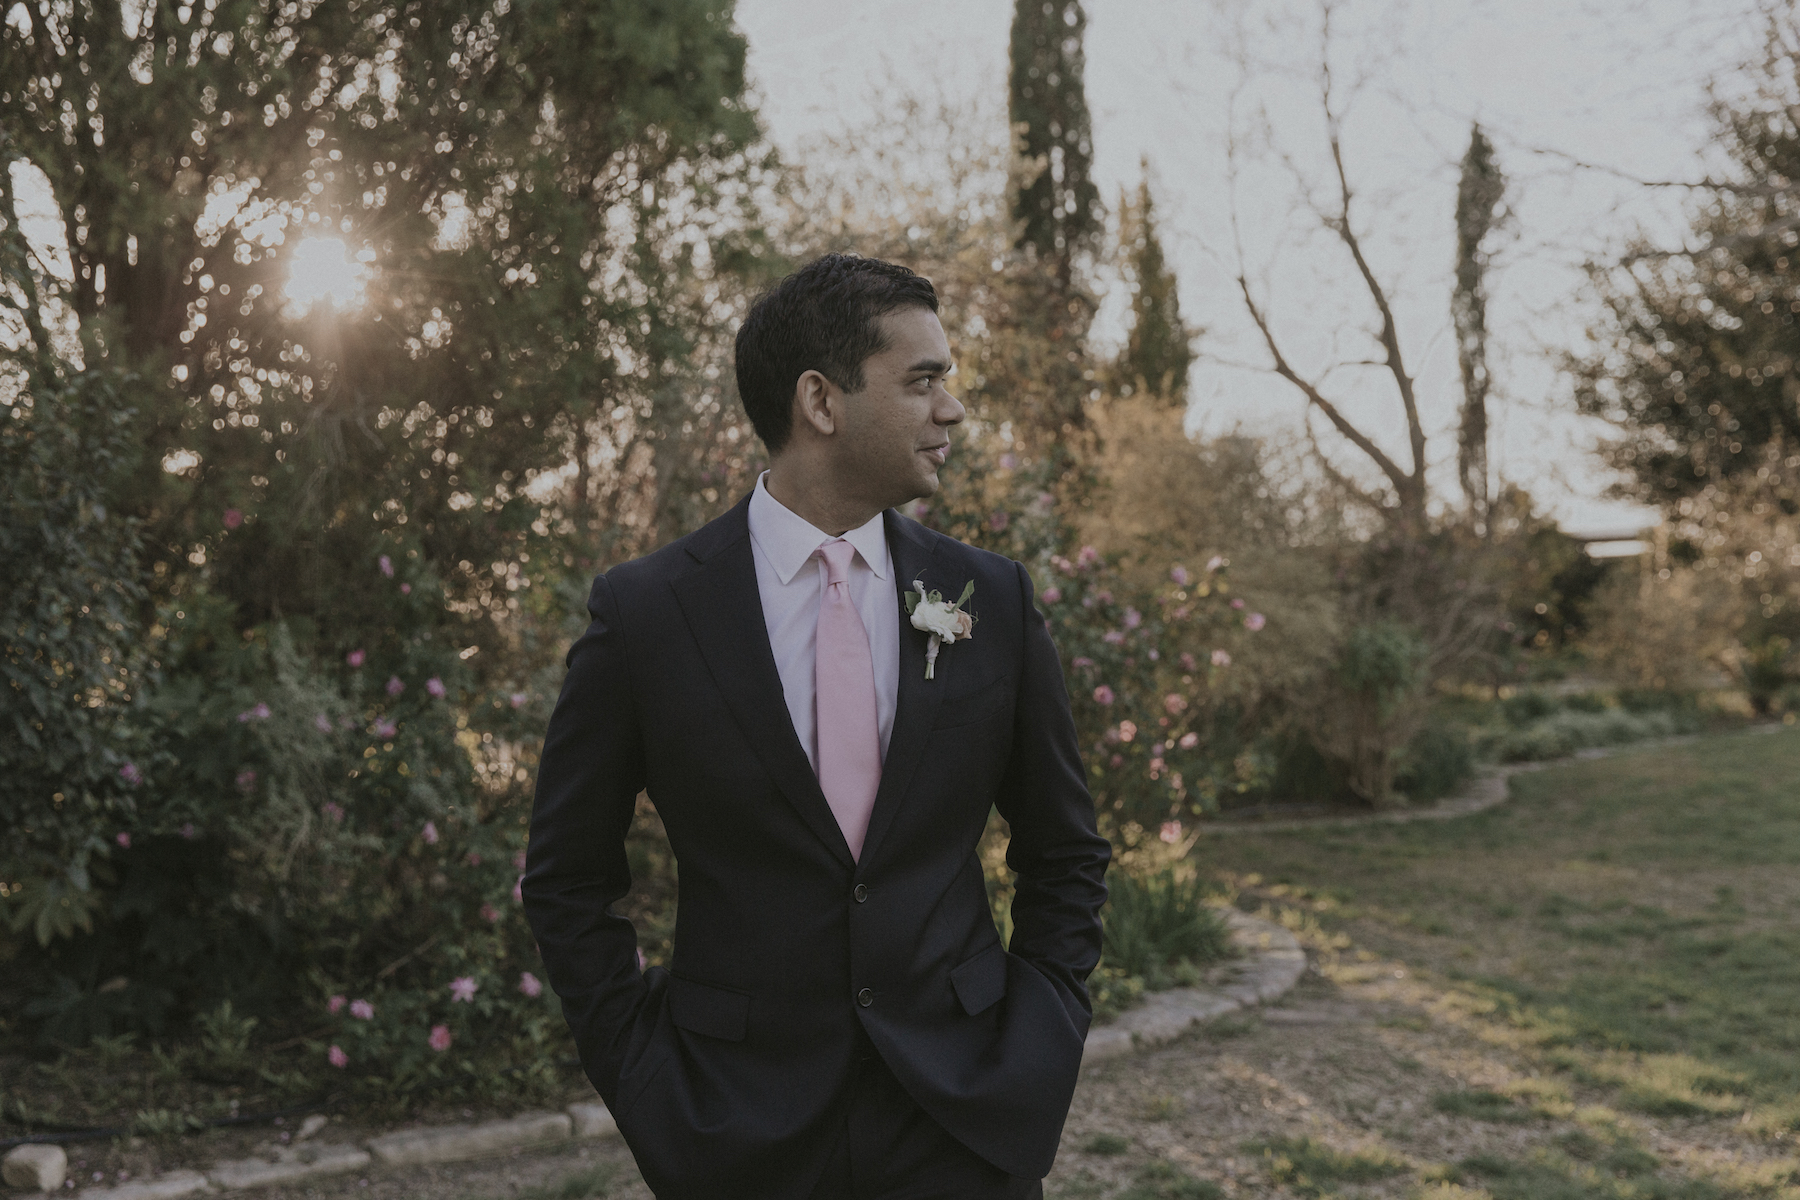 barr-mansion-wedding-austin-texas8871.JPG